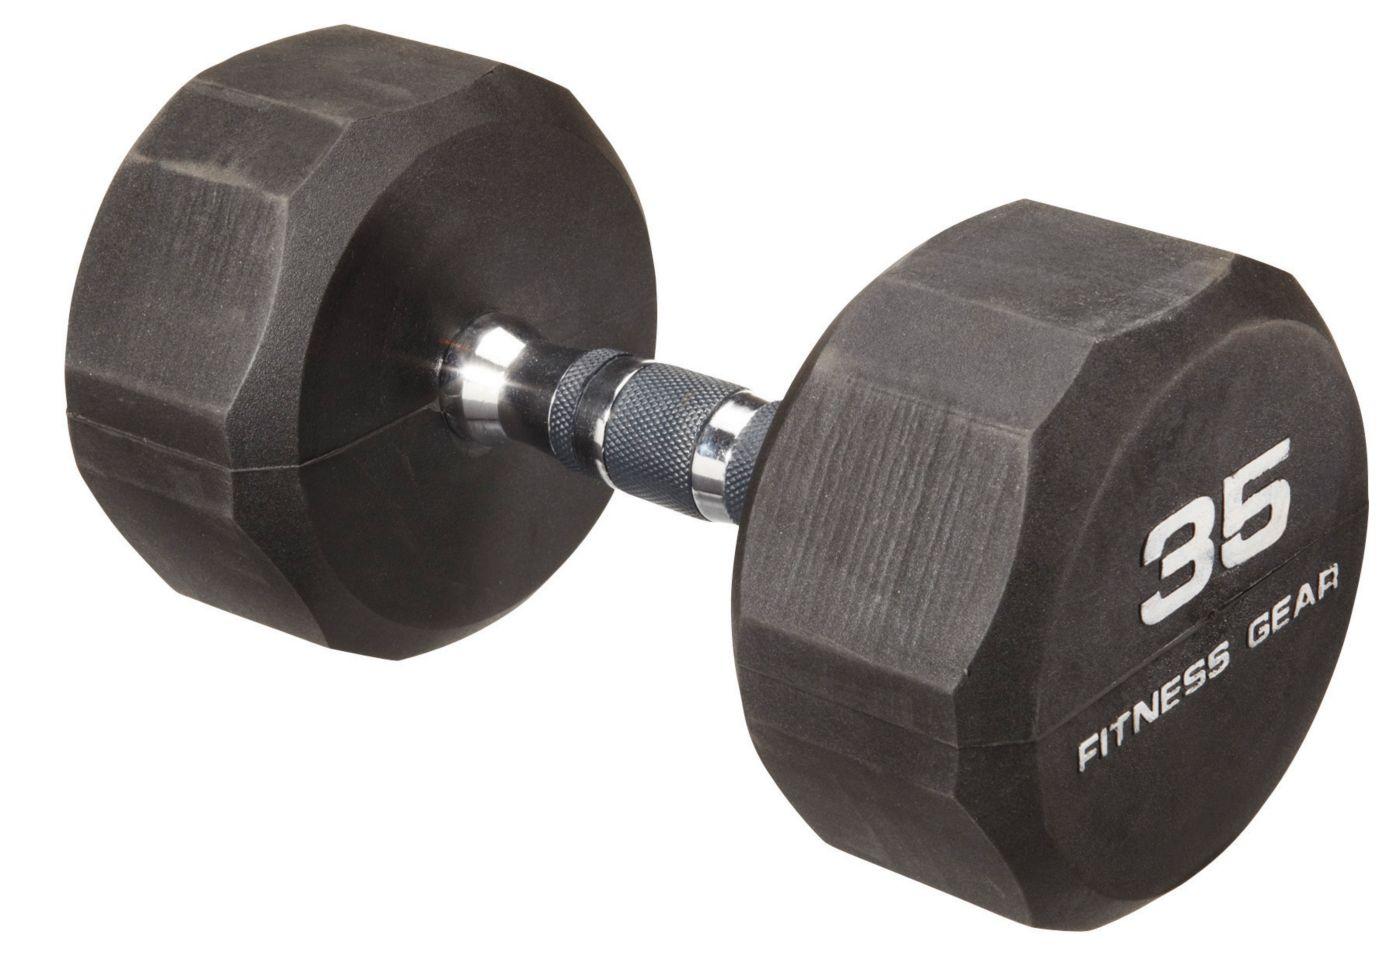 Fitness Gear 35 lb Rubber Hex Dumbbell